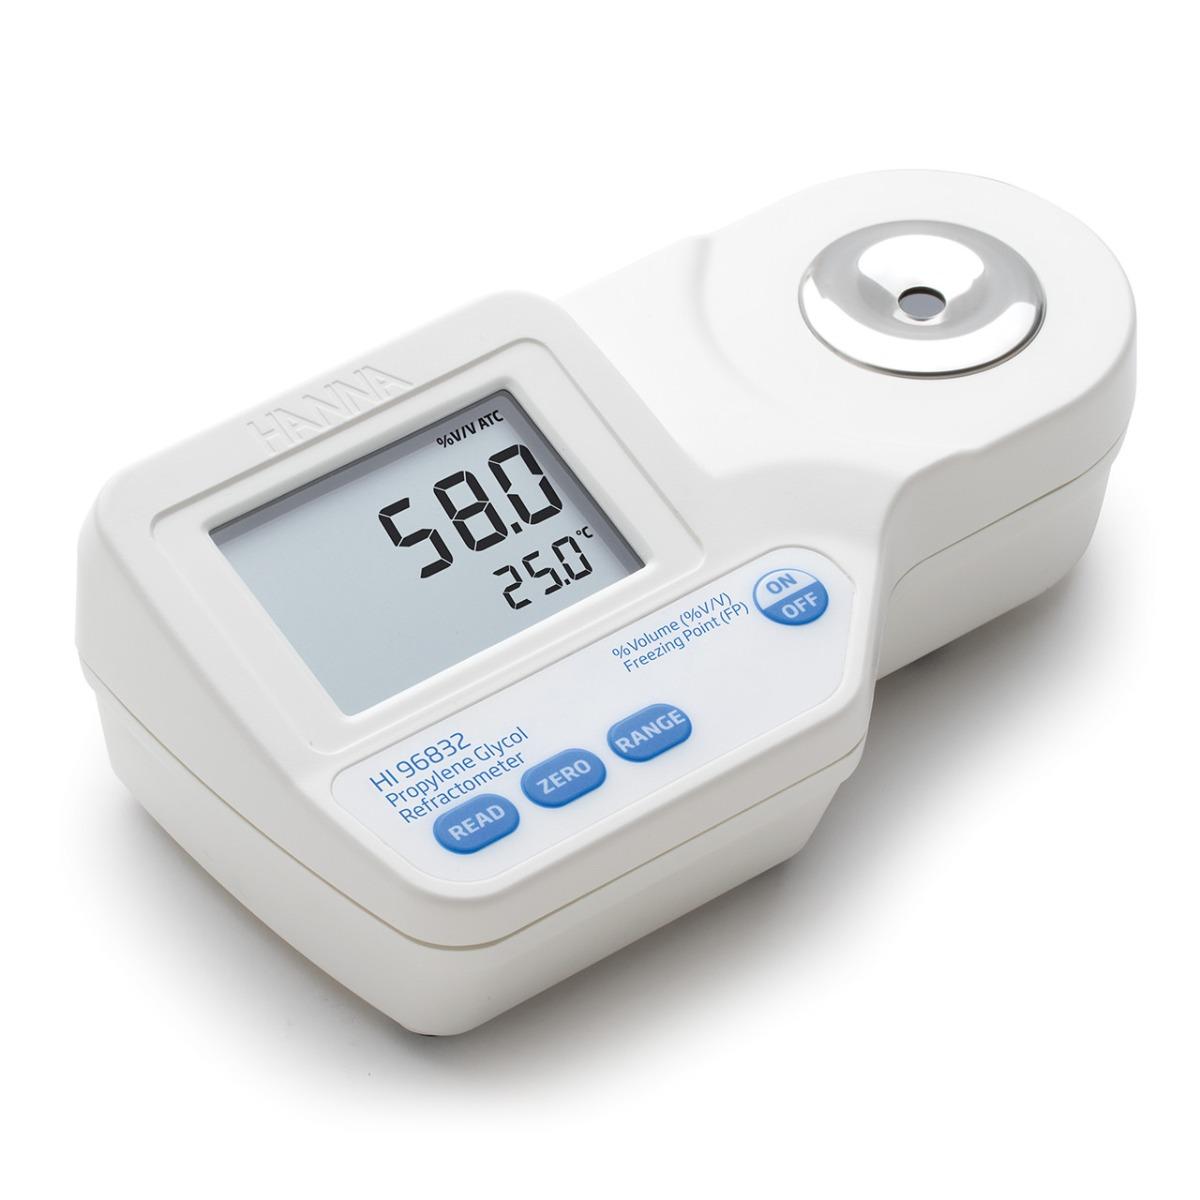 HI96832 Digital Refractometer for Propylene Glycol and Freezing Point Analysis